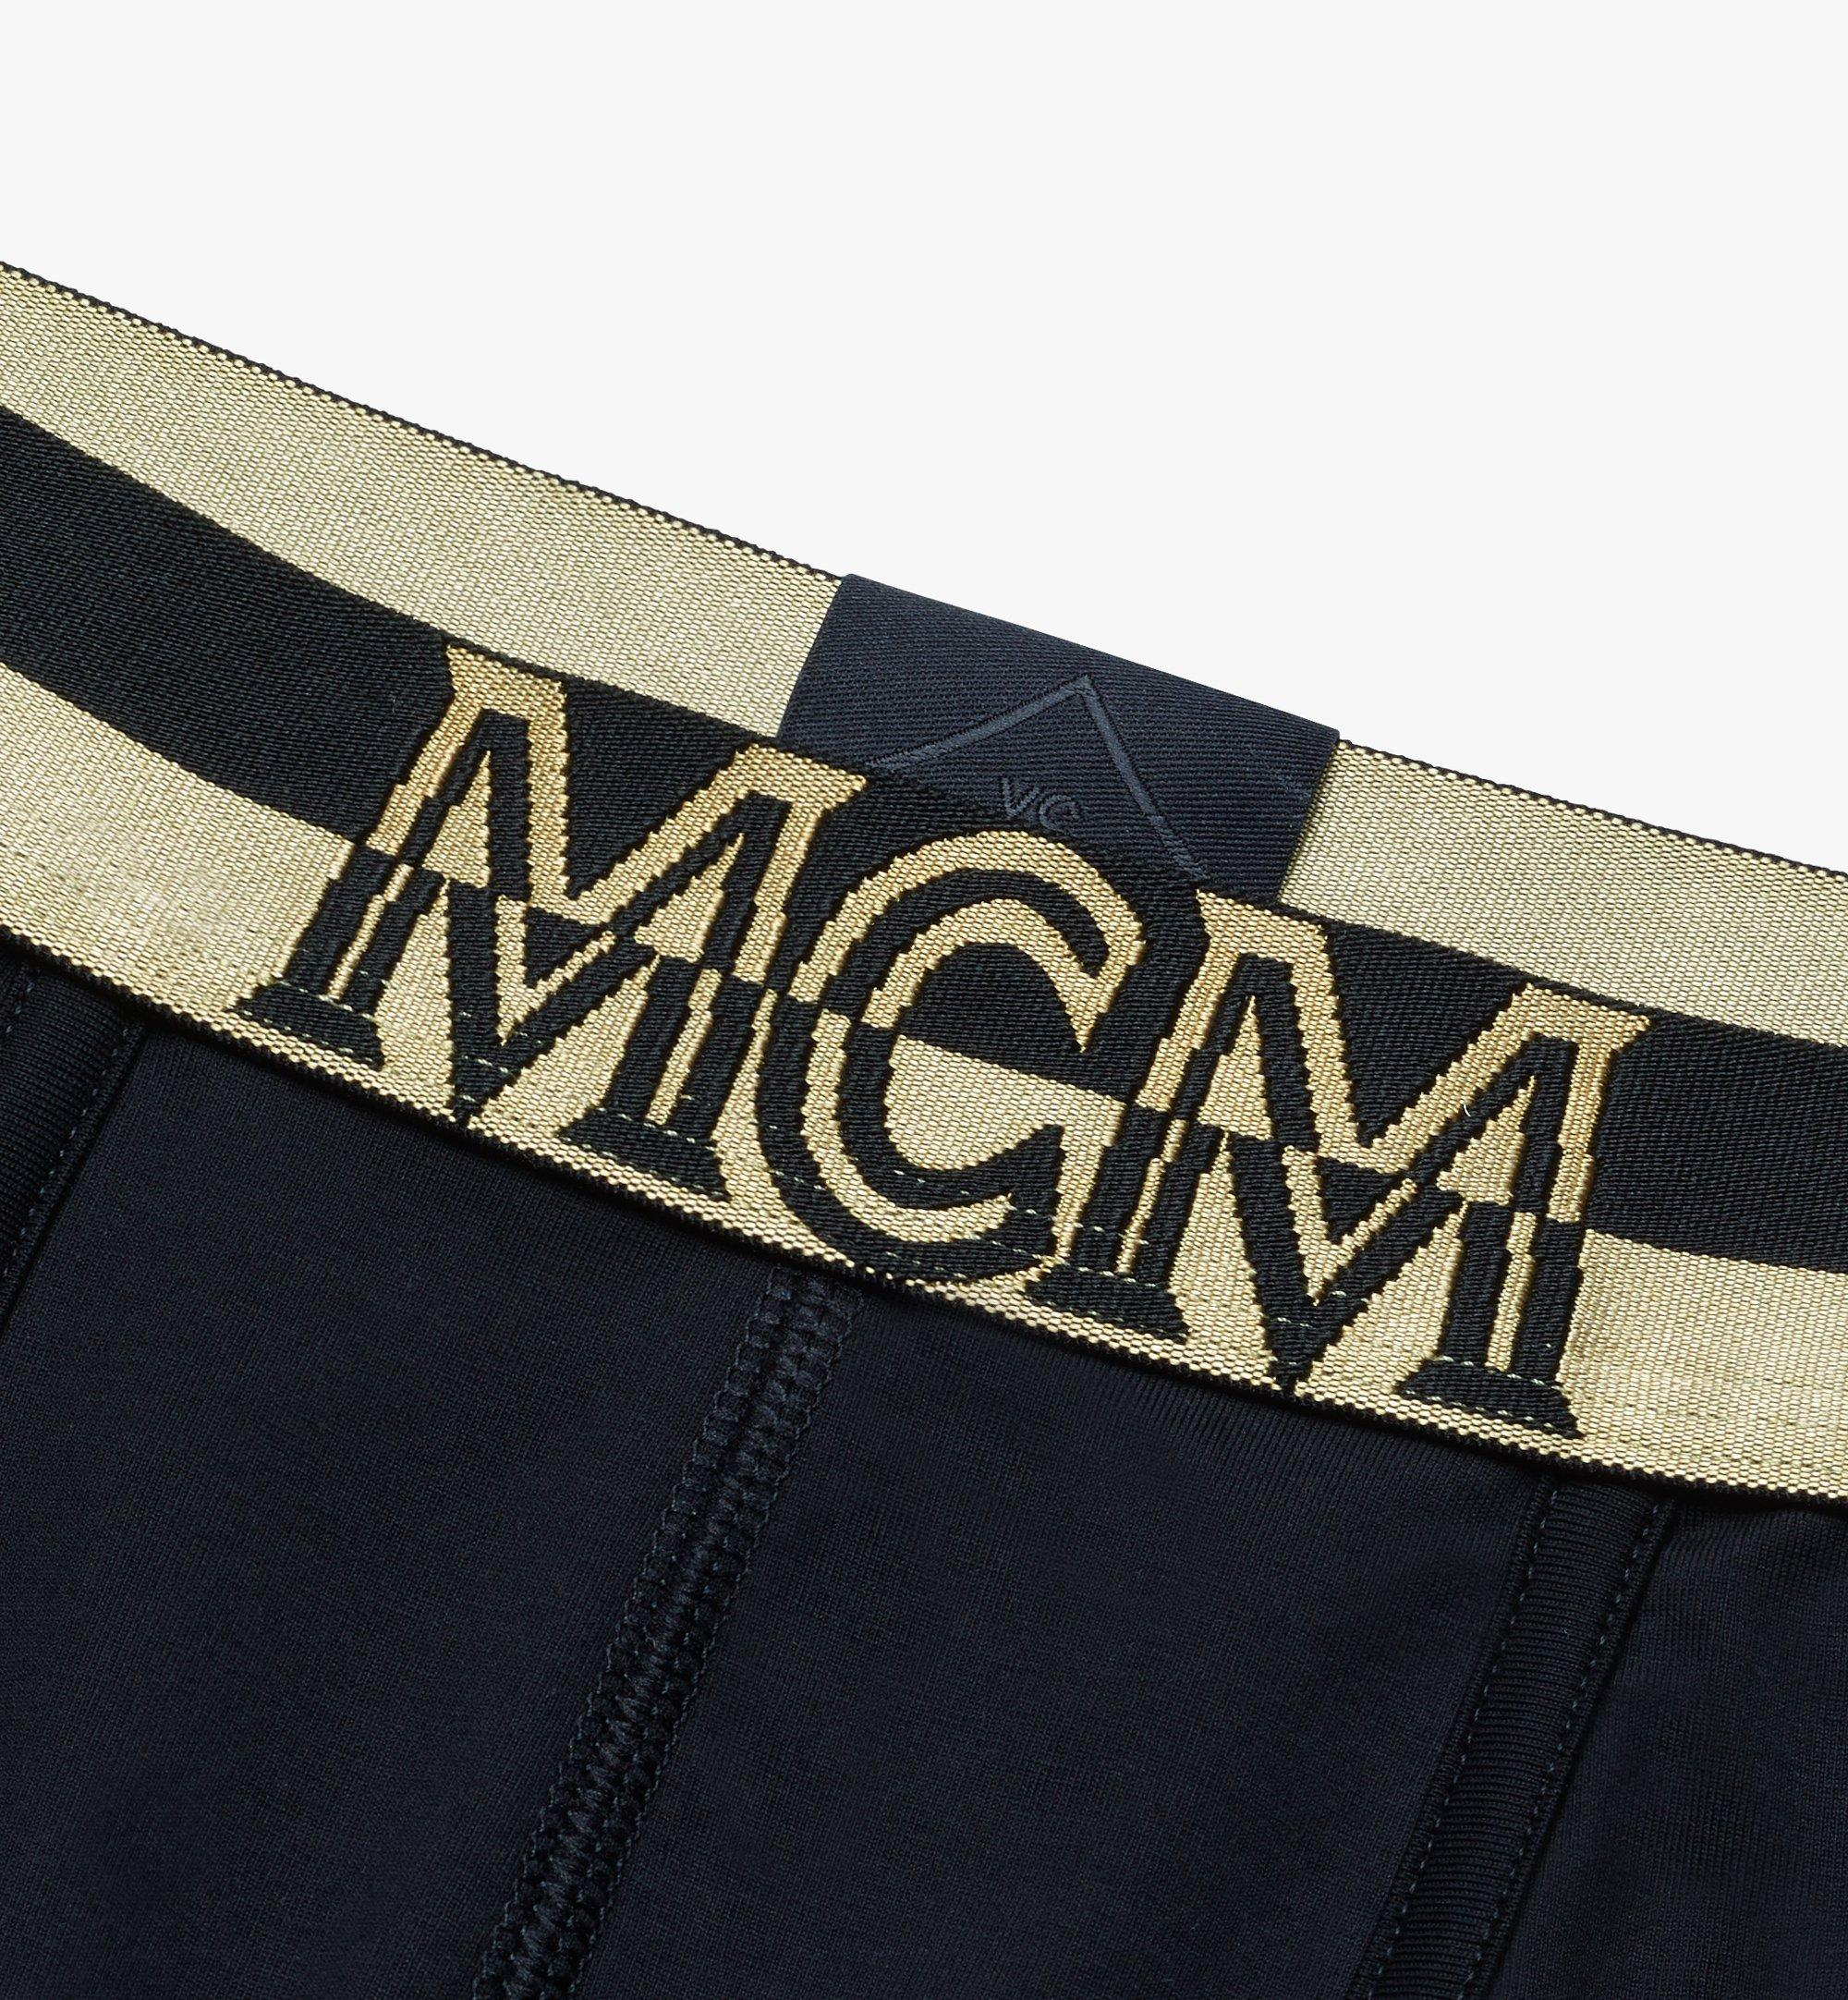 MCM 男士 1976 短款緊身四角褲 Black MHYASBM02BK0XS 更多視圖 2